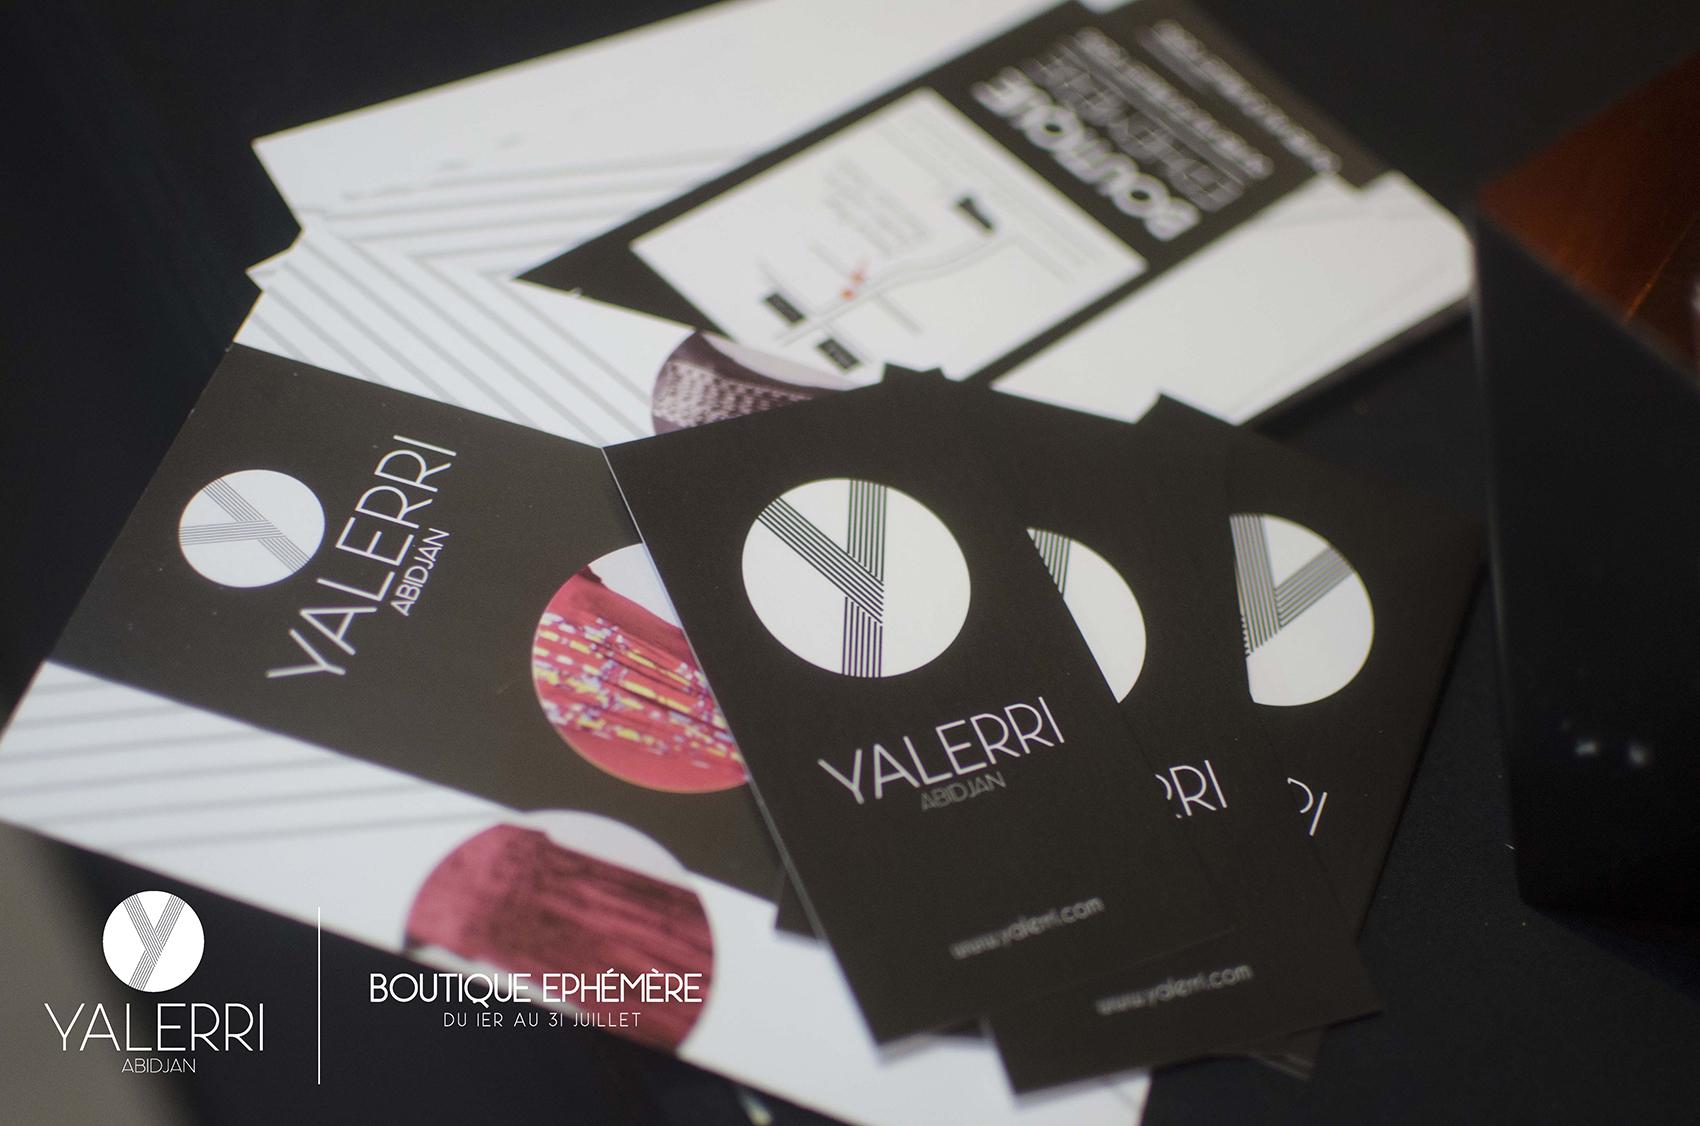 yalerri boutique (1)